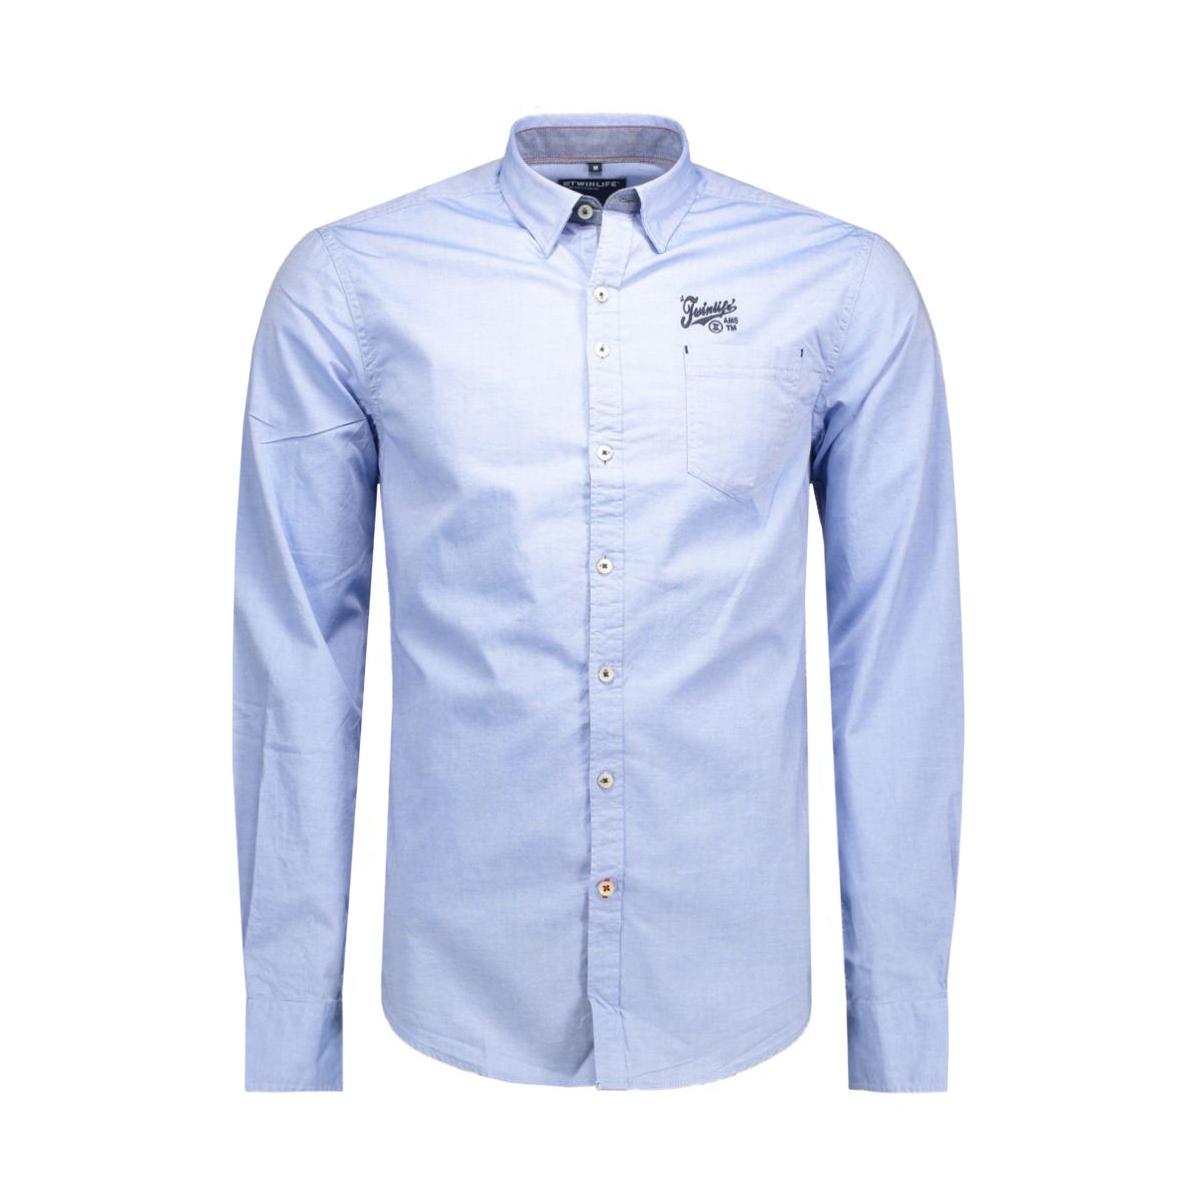 msh621610 twinlife overhemd 6159